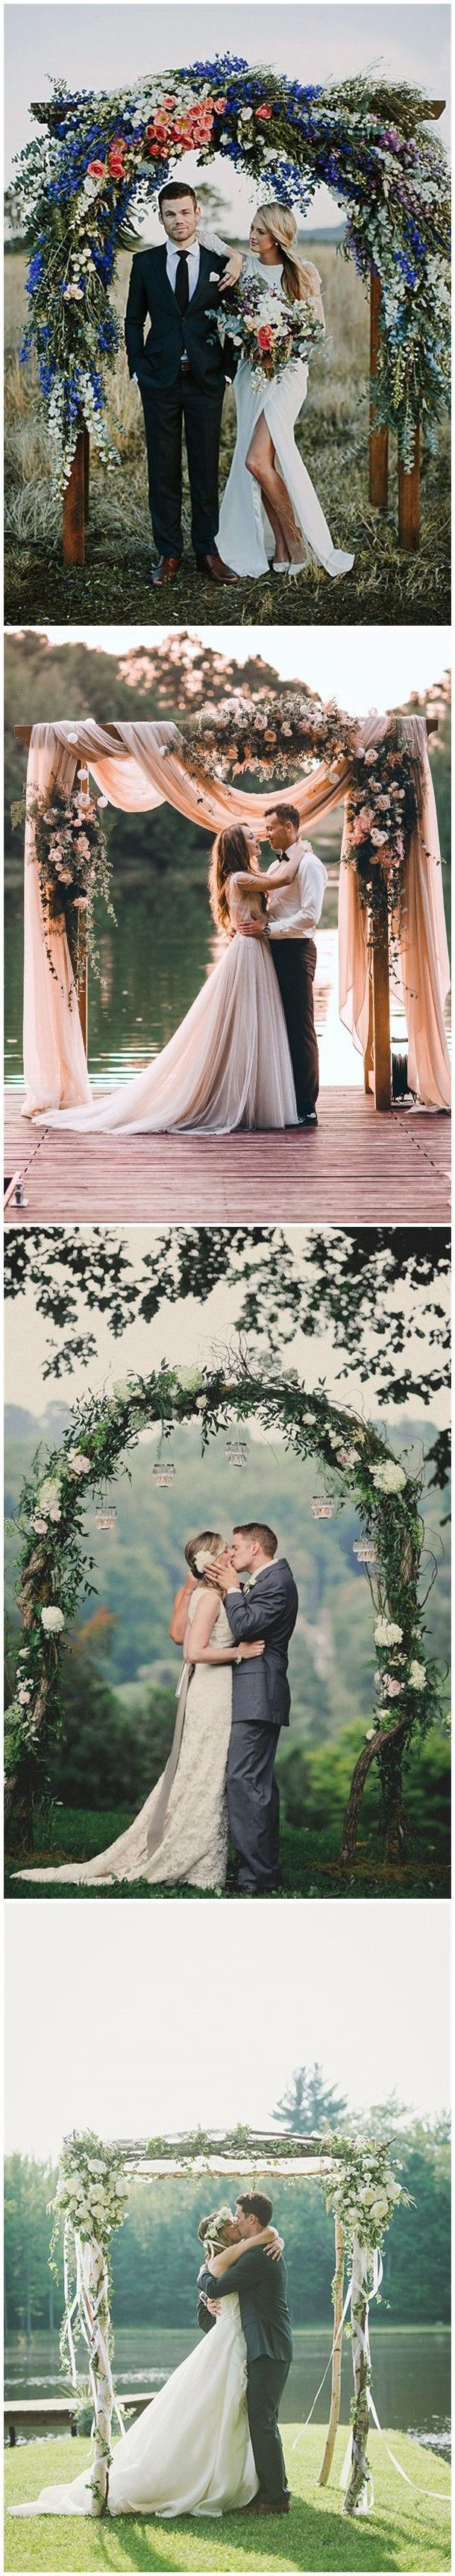 Canary yellow wedding decorations november 2018  best Wedding Flowers images on Pinterest  Wedding ideas